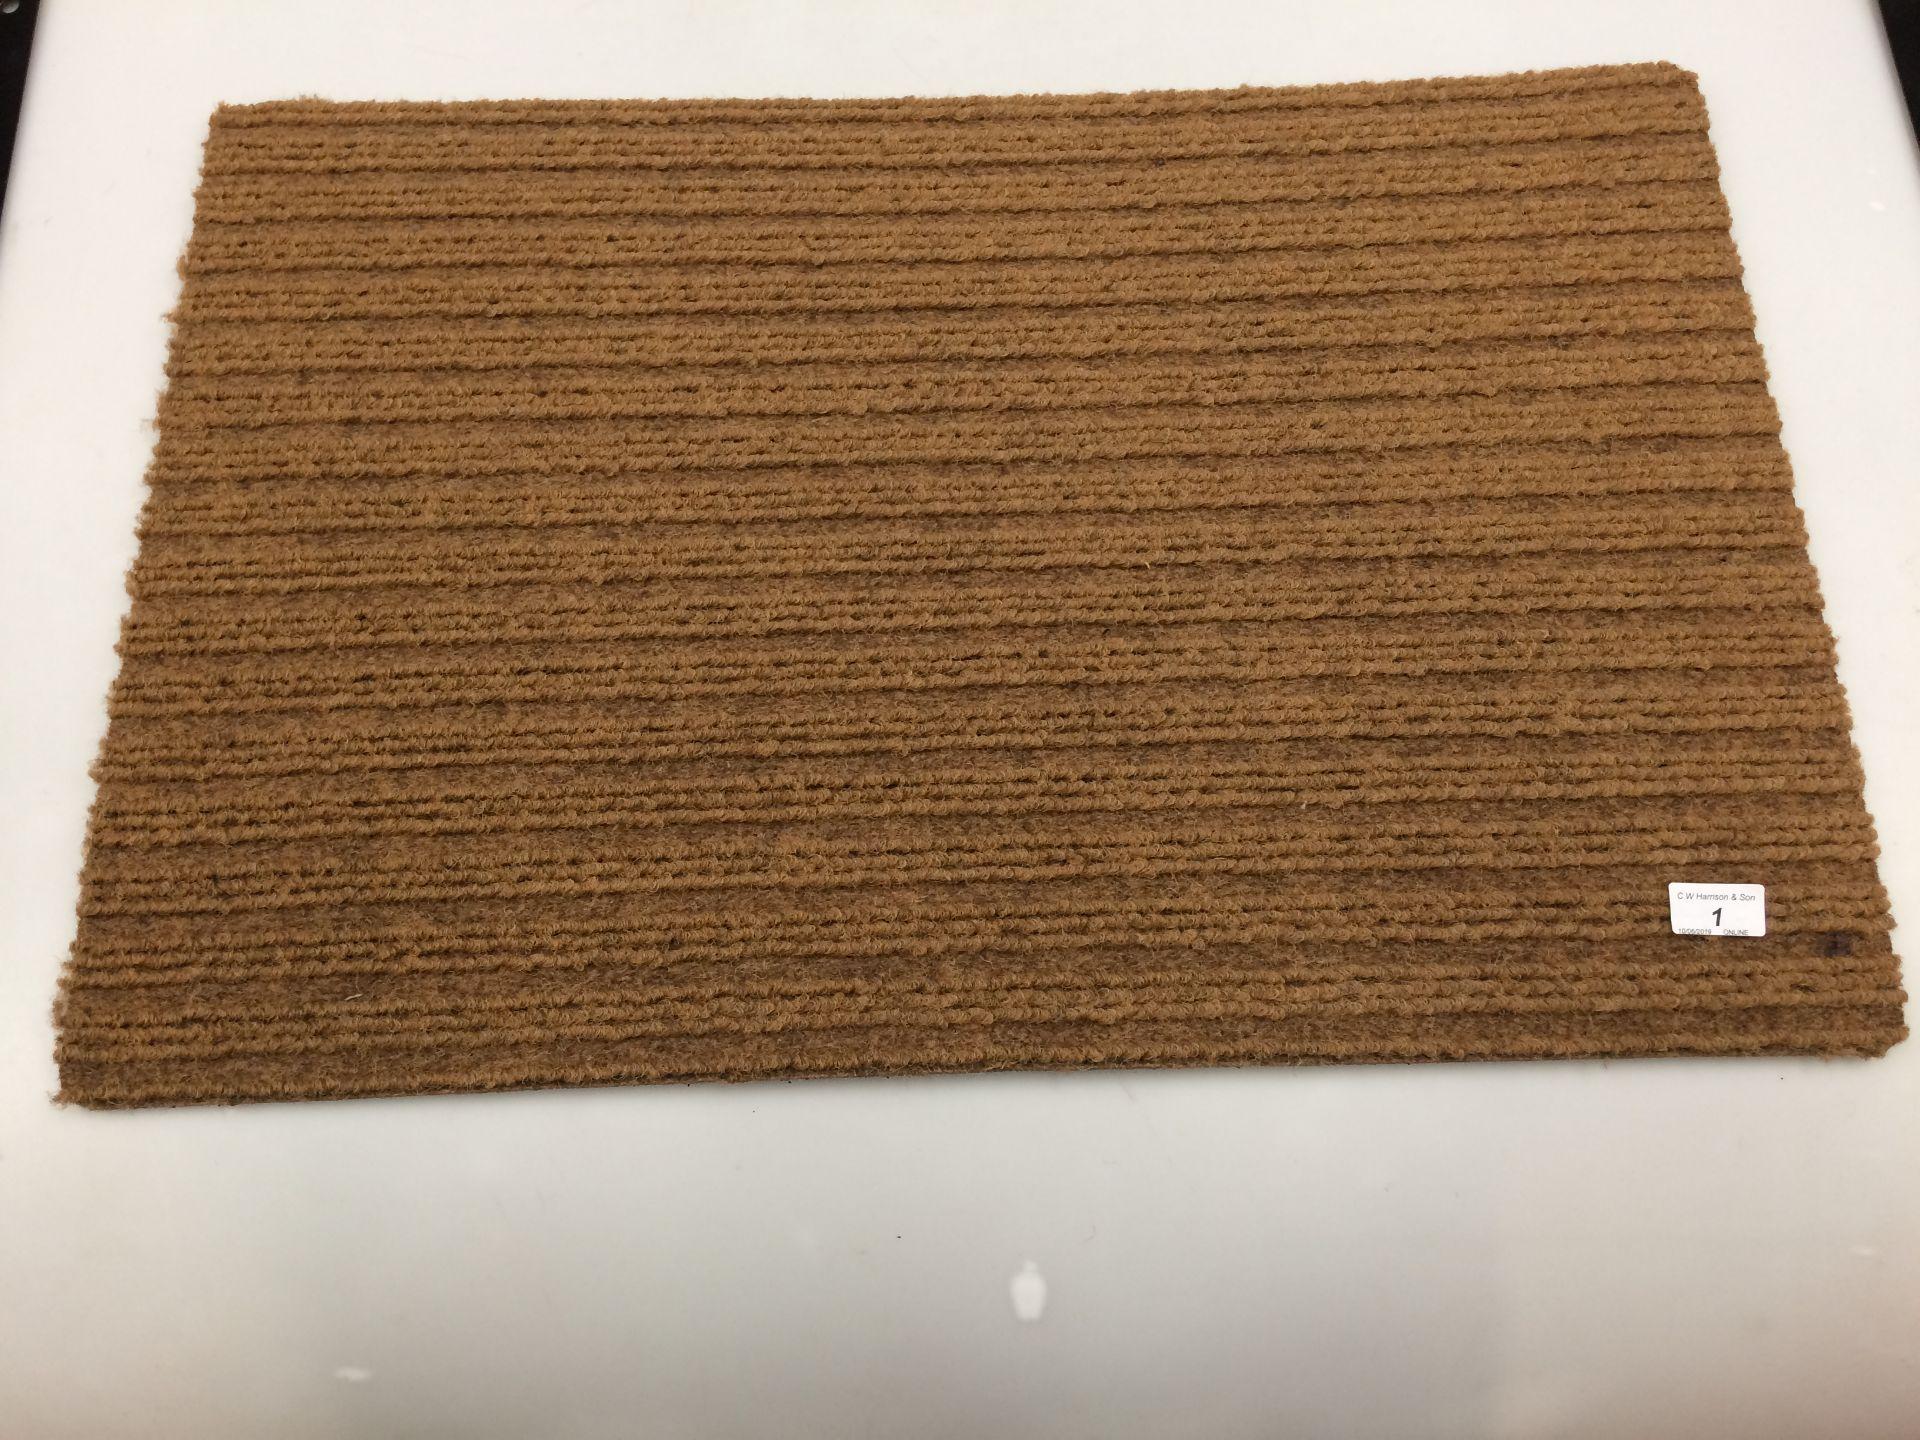 Lot 1 - 10 x brown door mats with rubber anti-slip inlay each 50 x 75cm